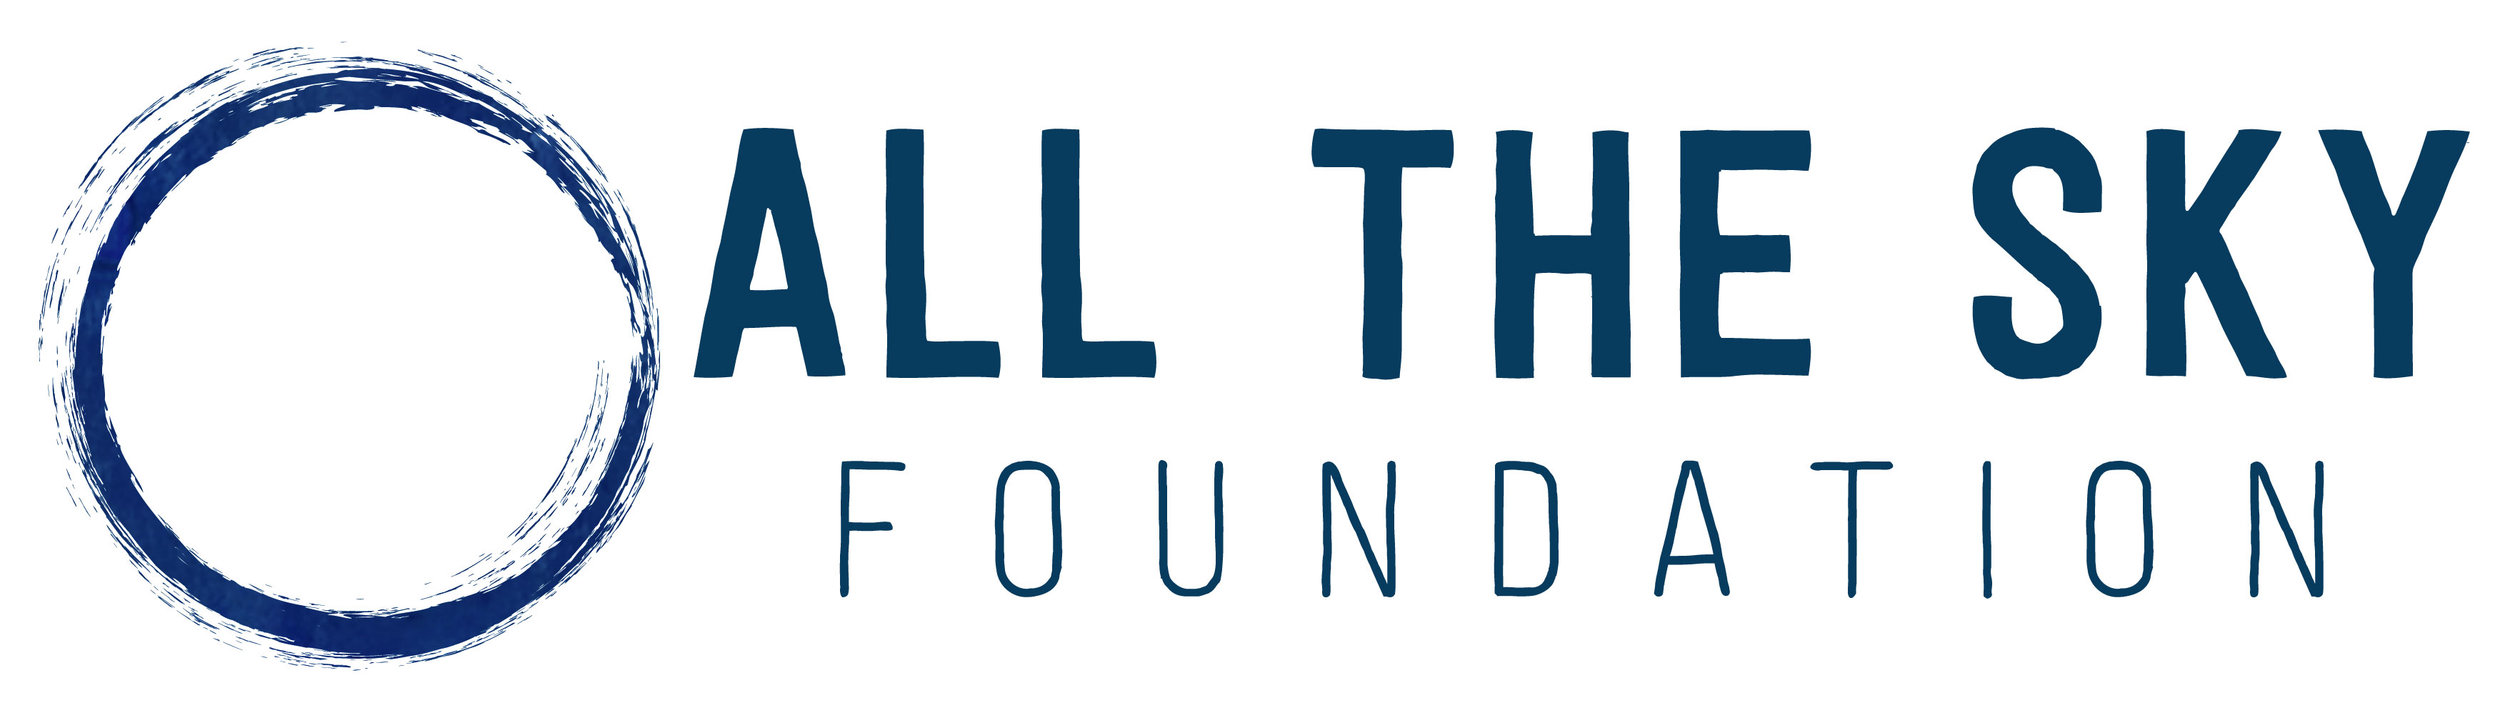 all-the-sky-foundation-horizontal.jpg